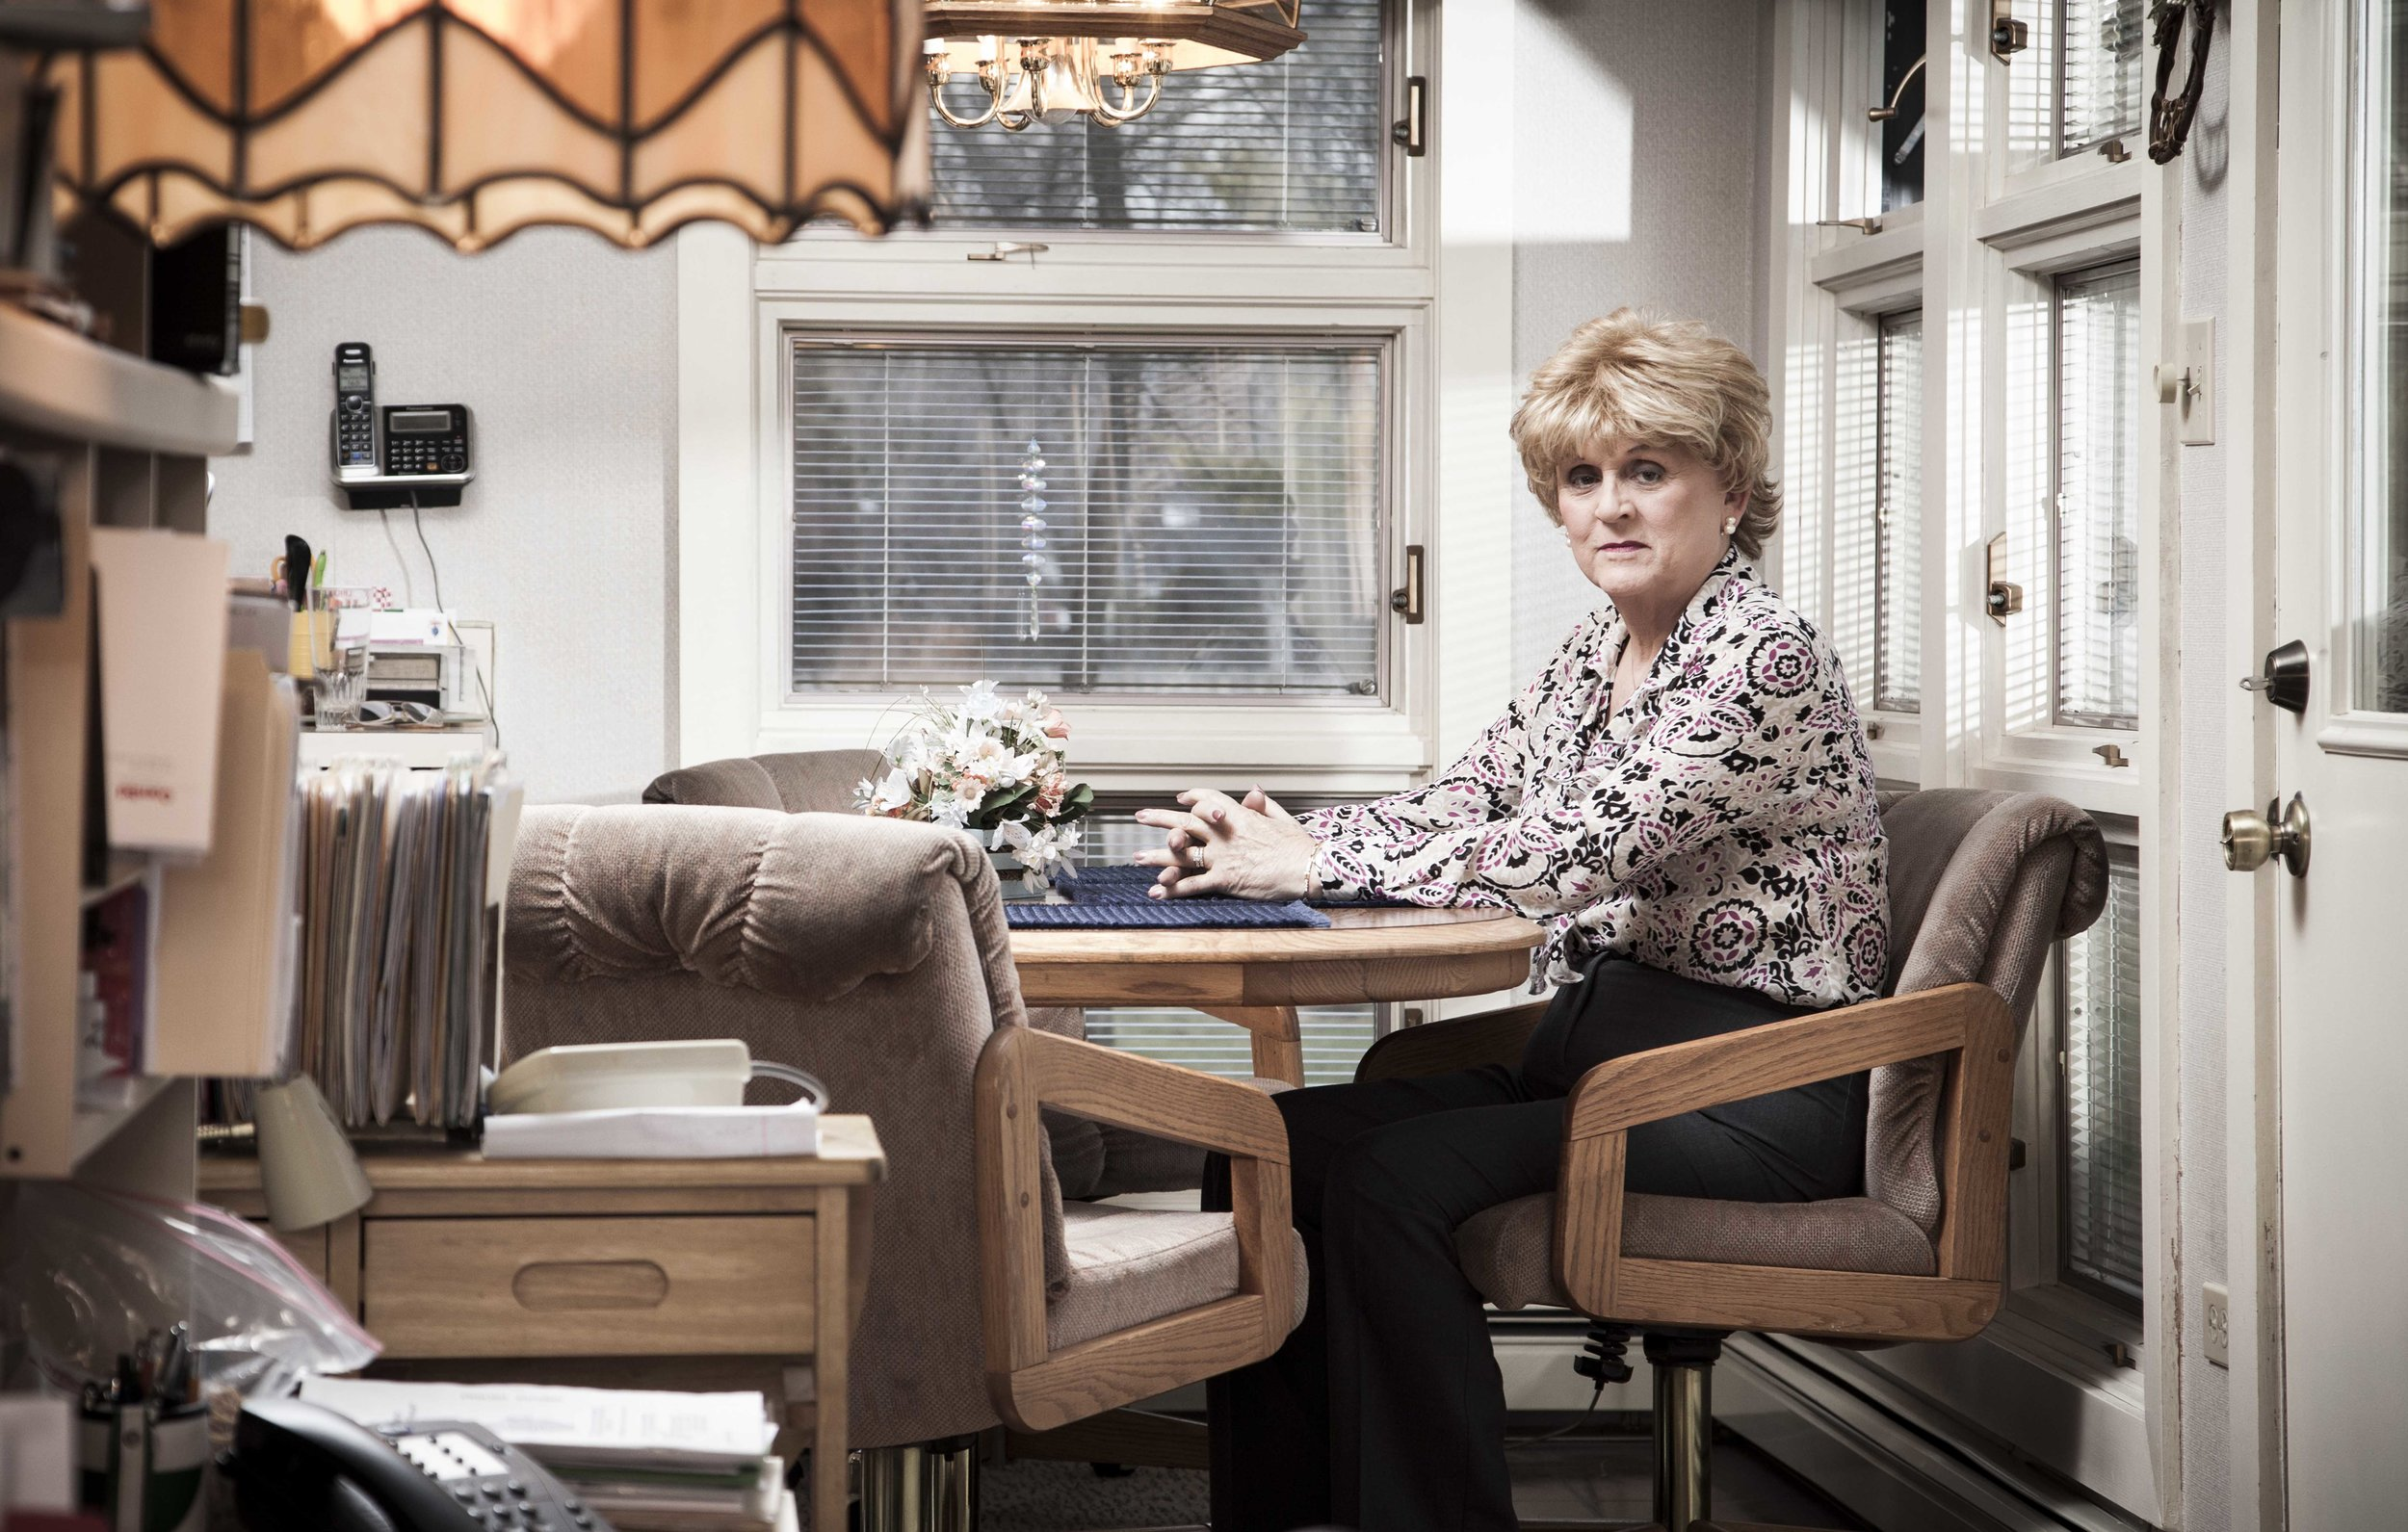 Katie, Age 77